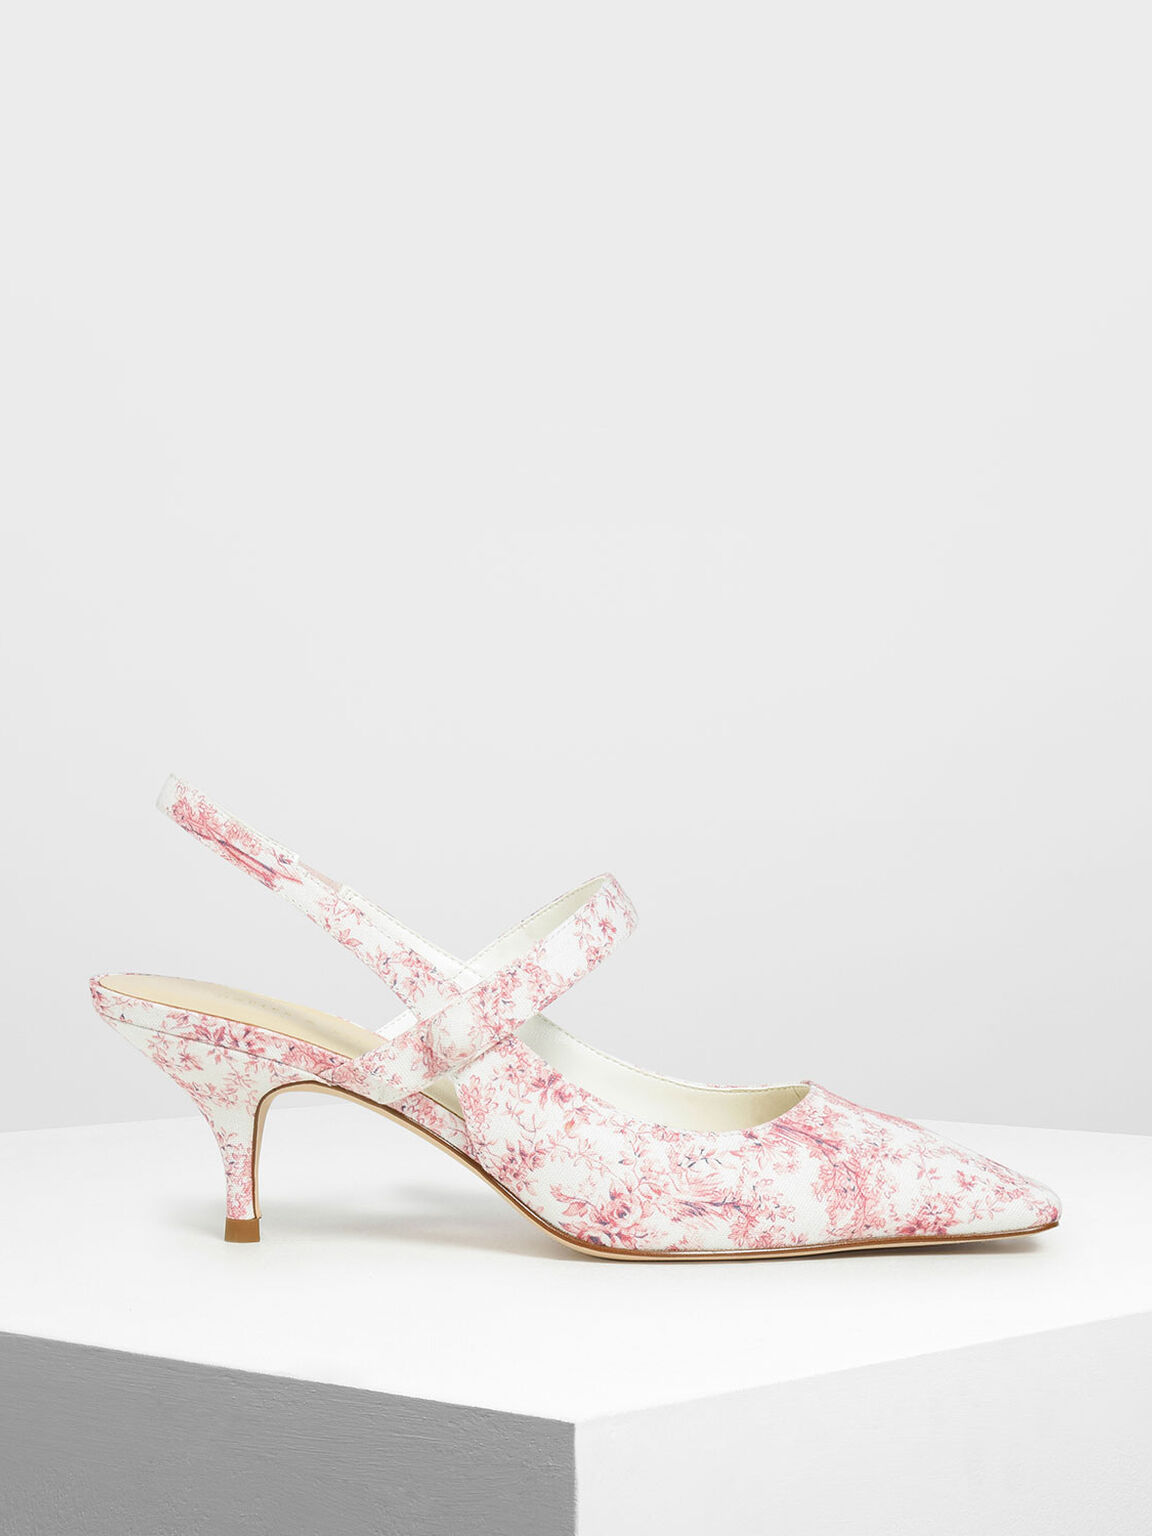 Printed Square Toe Mary Jane Slingback Heels, Pink, hi-res